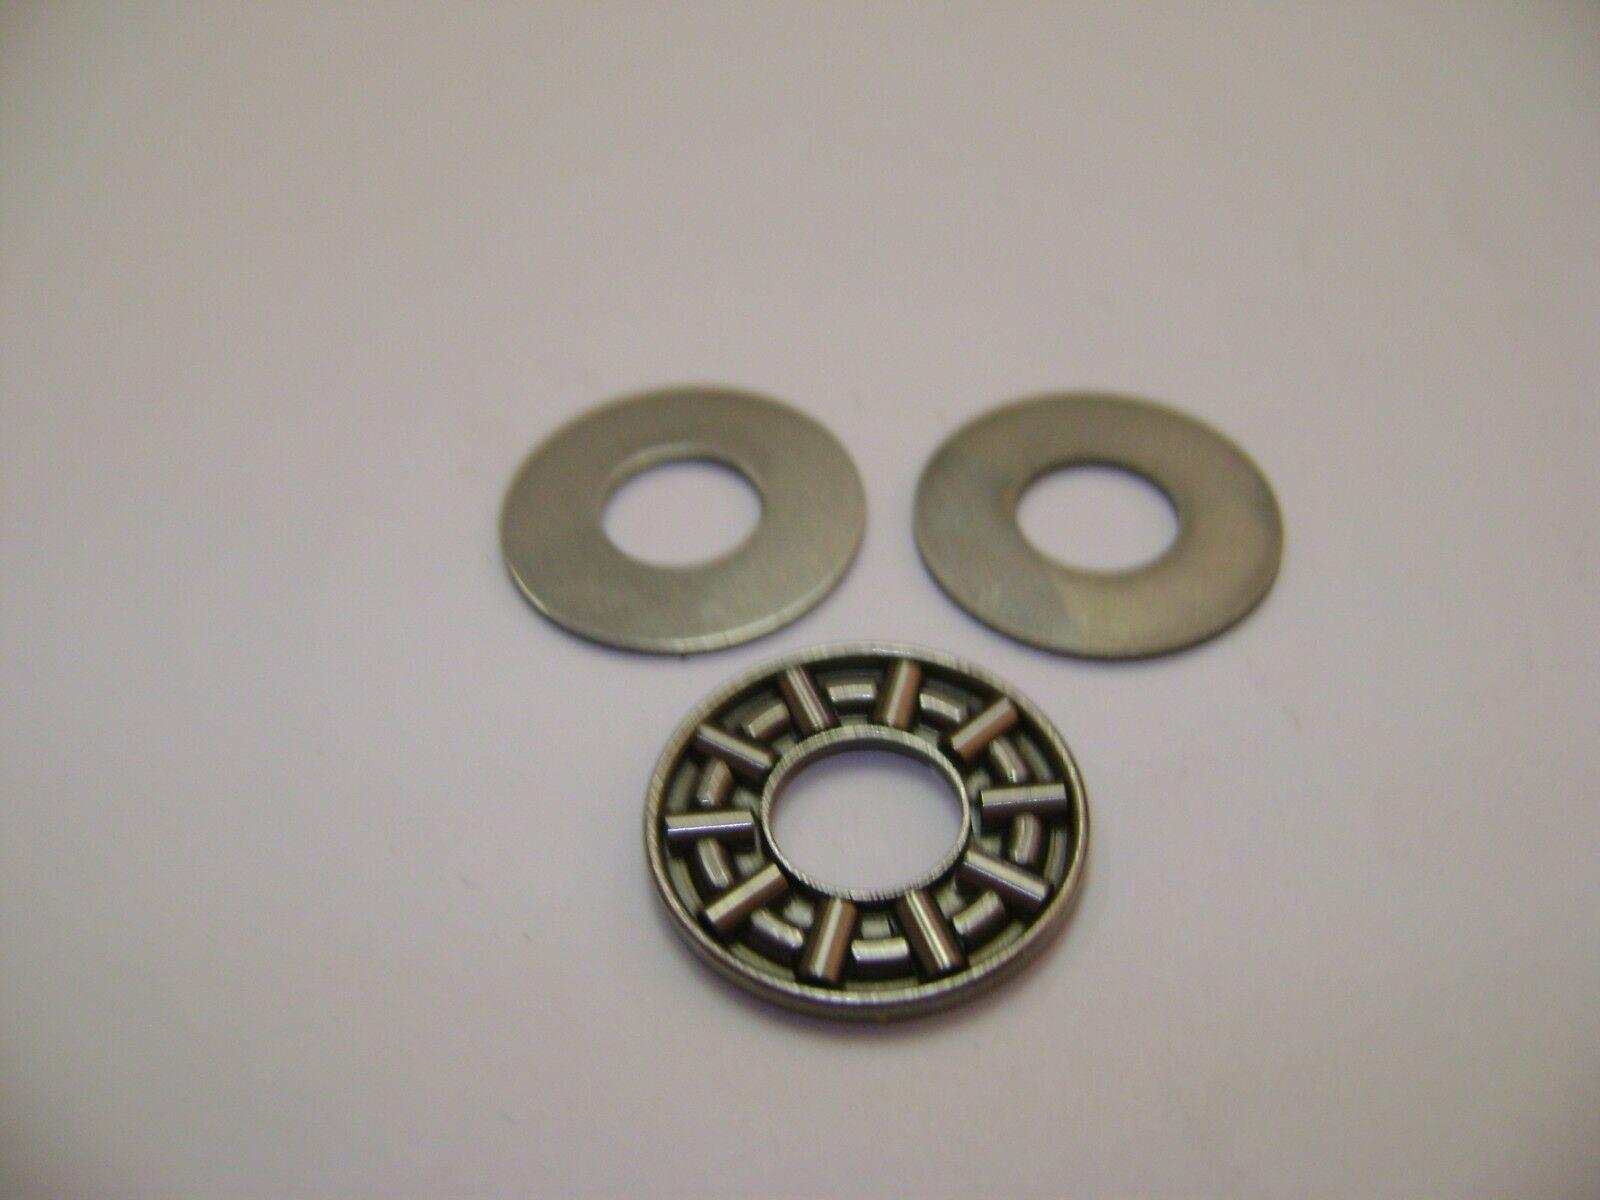 Length: 7PH1975 Ochoos Rubber Ribbed PH Belt Model:PH1930 PH1950 PH1951 PH1956 PH1975 7ribs Cloth Dryer Machine Electric Parts